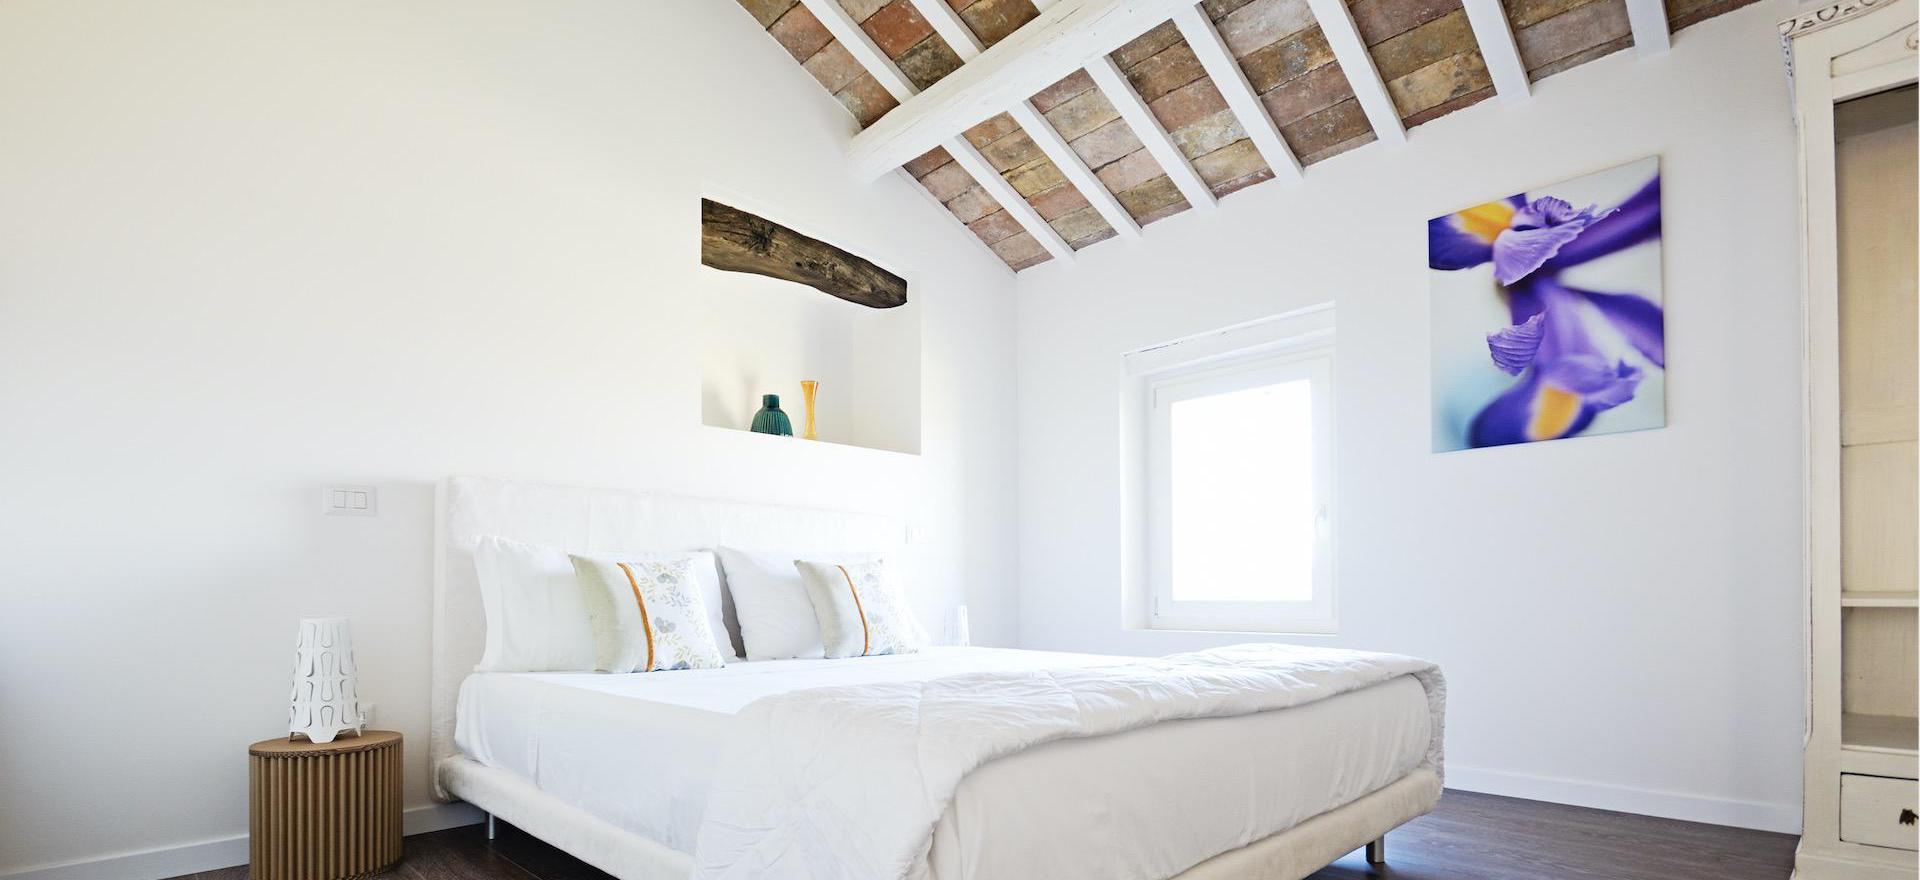 Agriturismo Le Marche Prachtig gelegen country house met bistrot